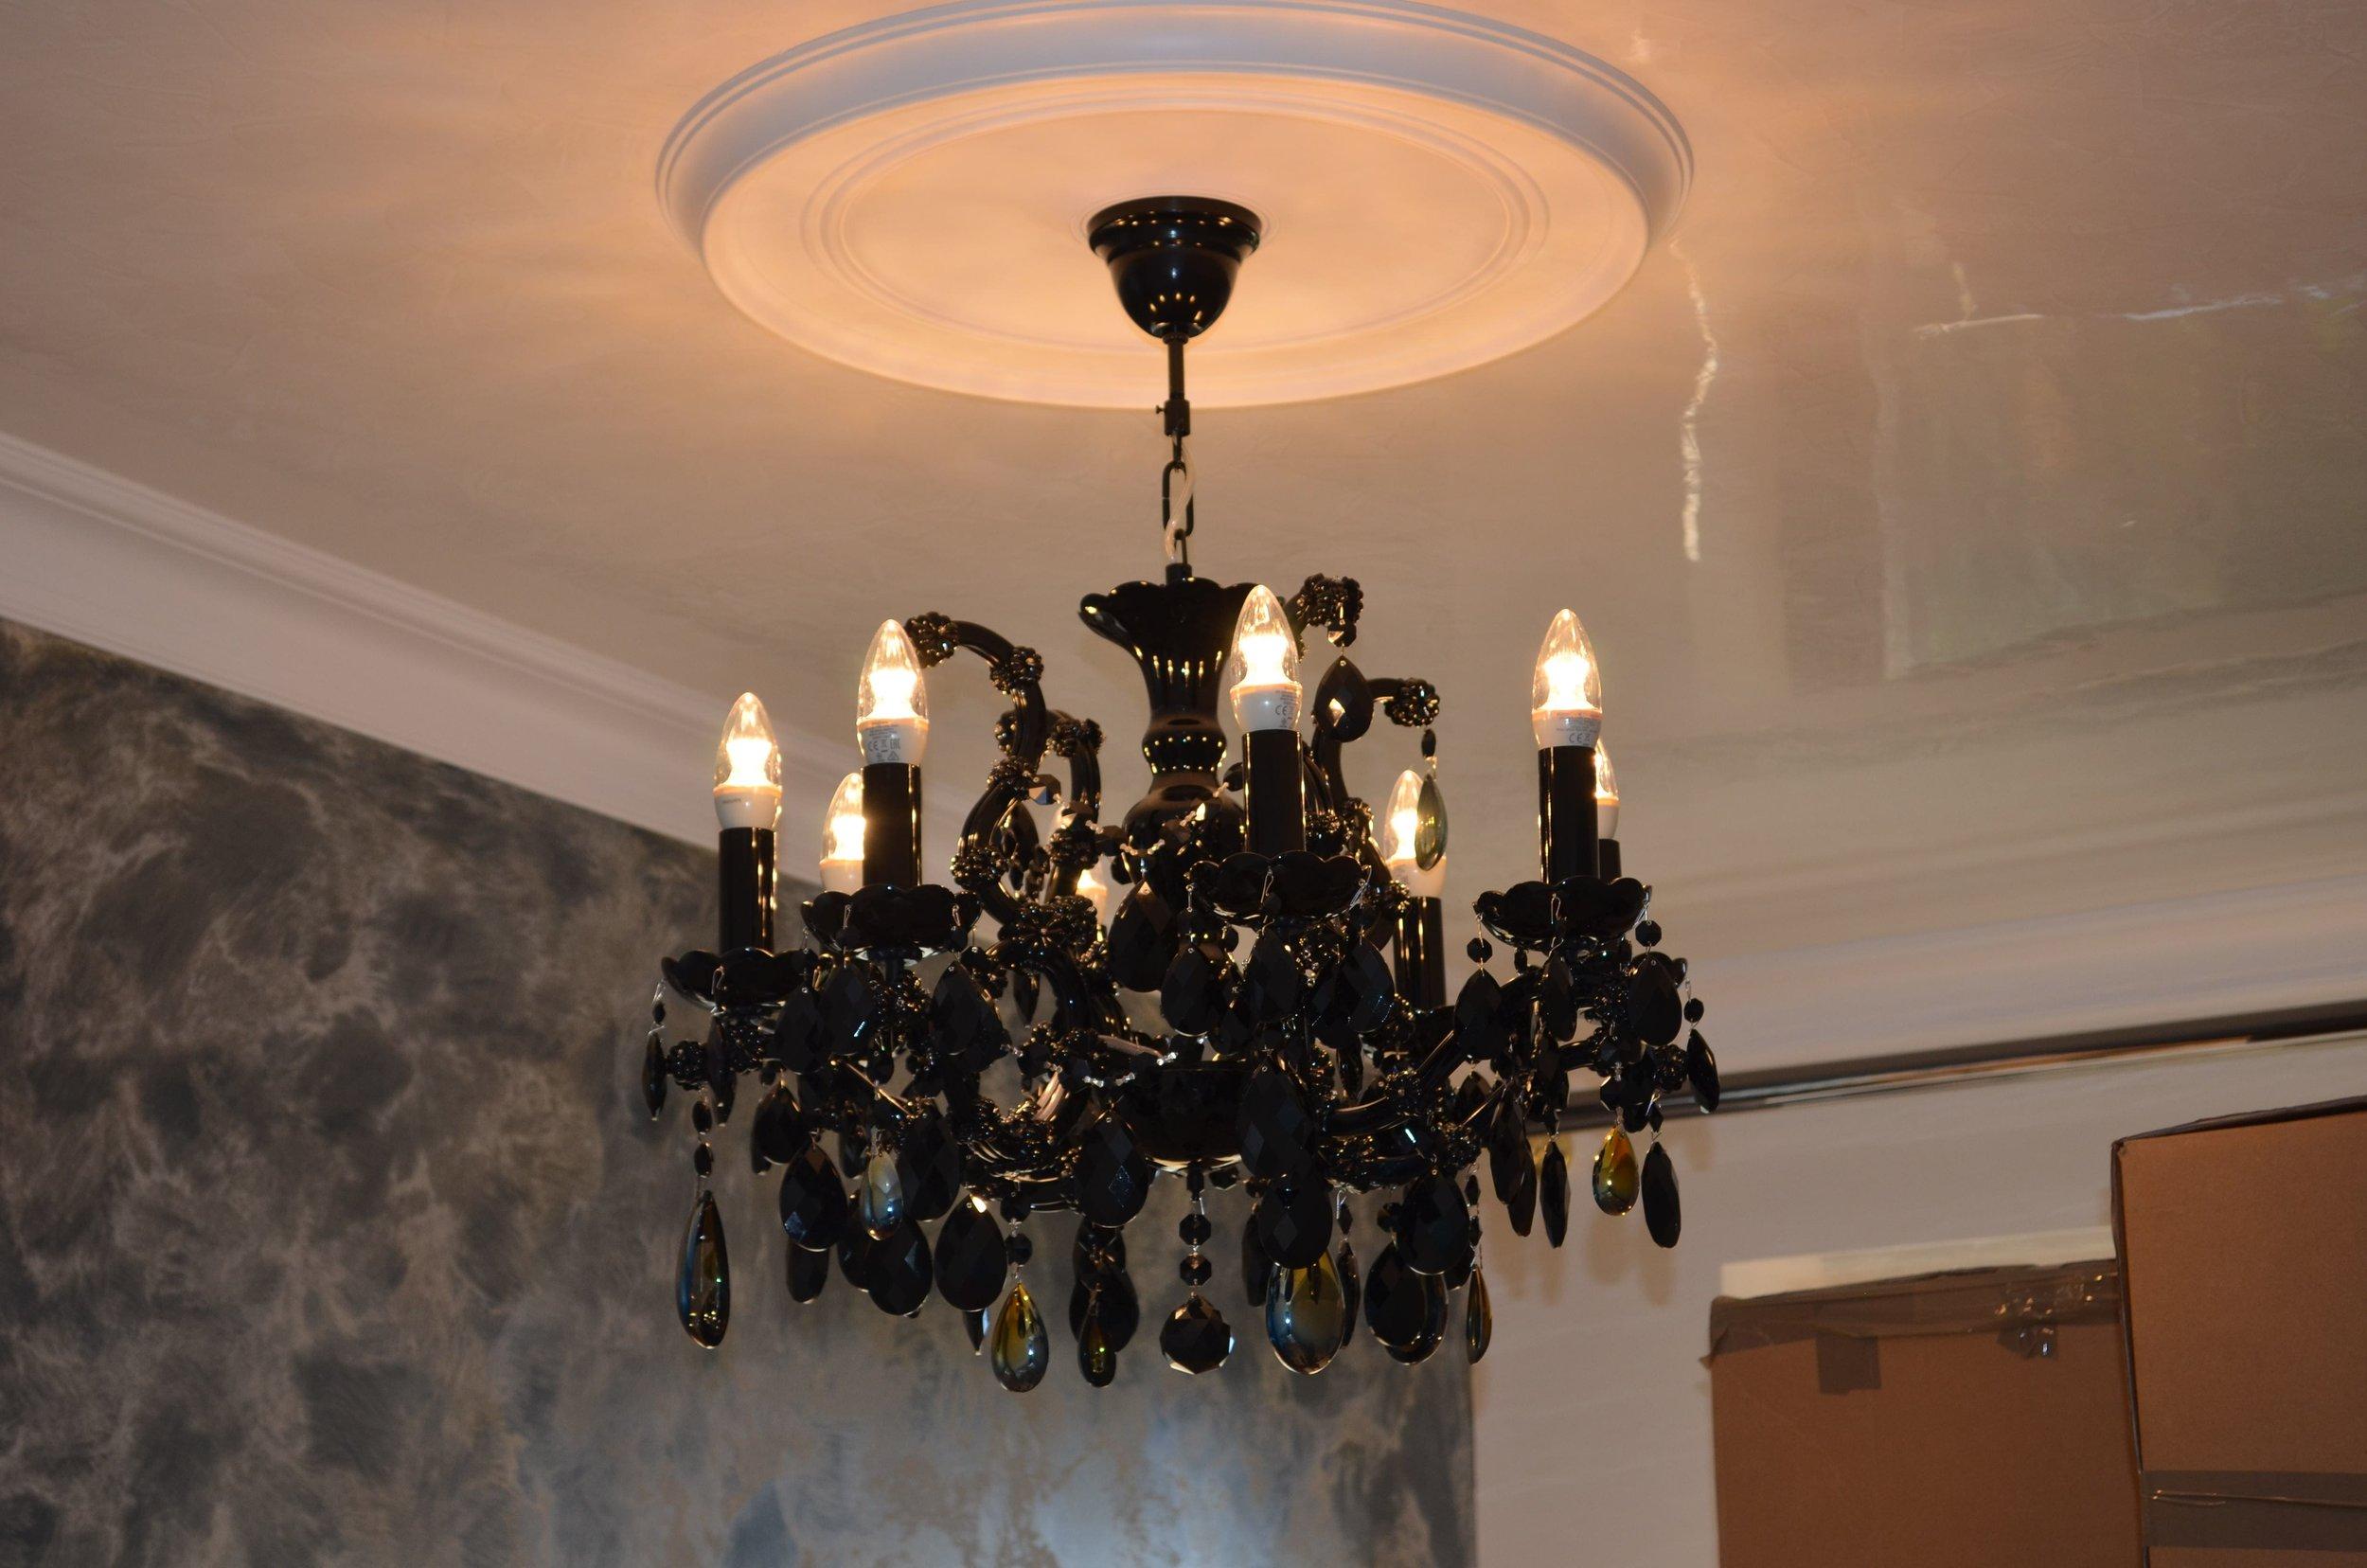 wranovsky-chandeliers-romania-14.JPG